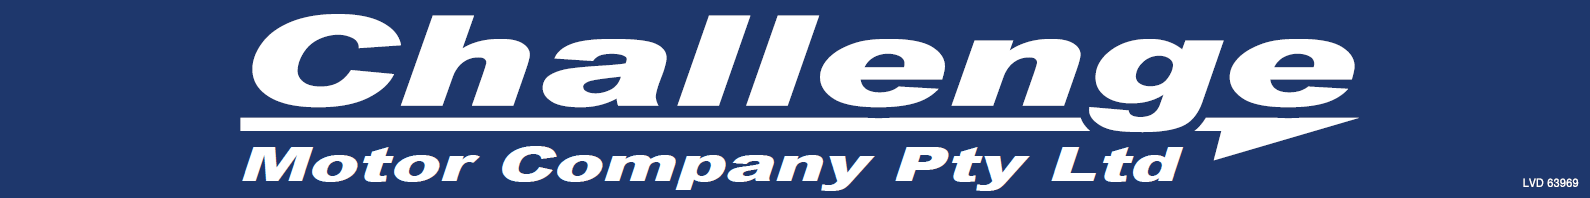 Challenge Motor Company